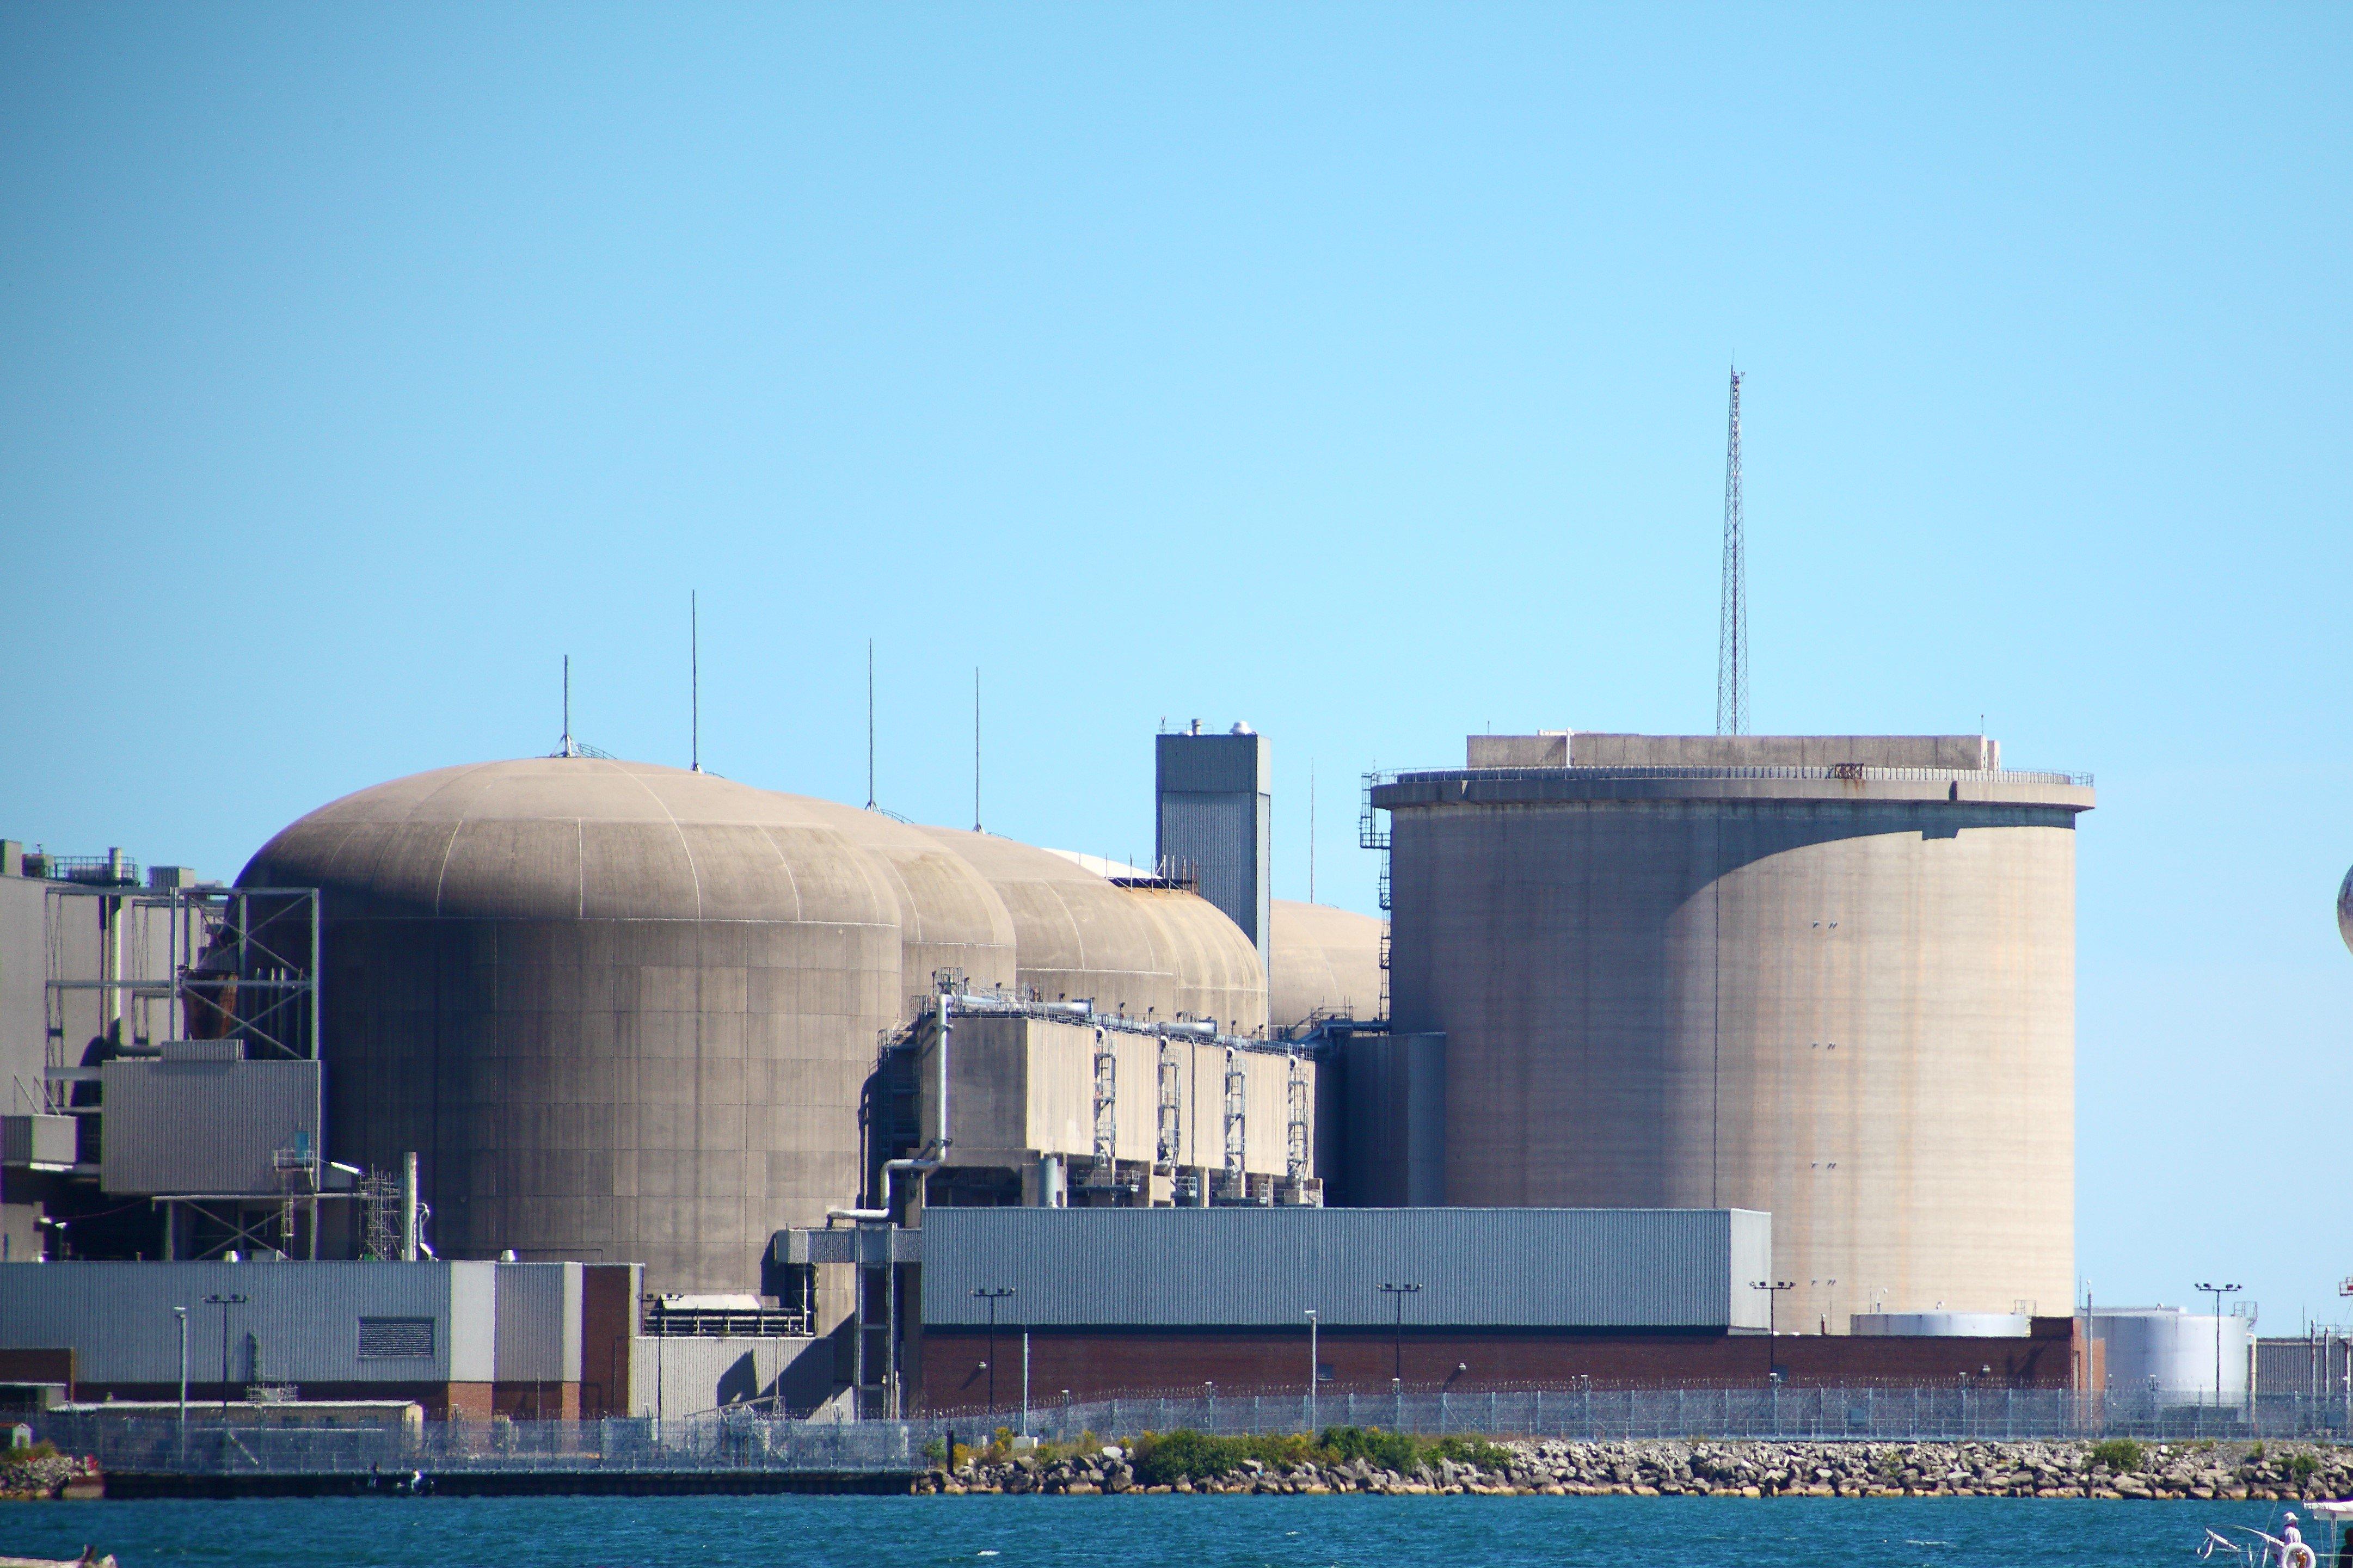 Inspecting nuclear reactors: CANDU